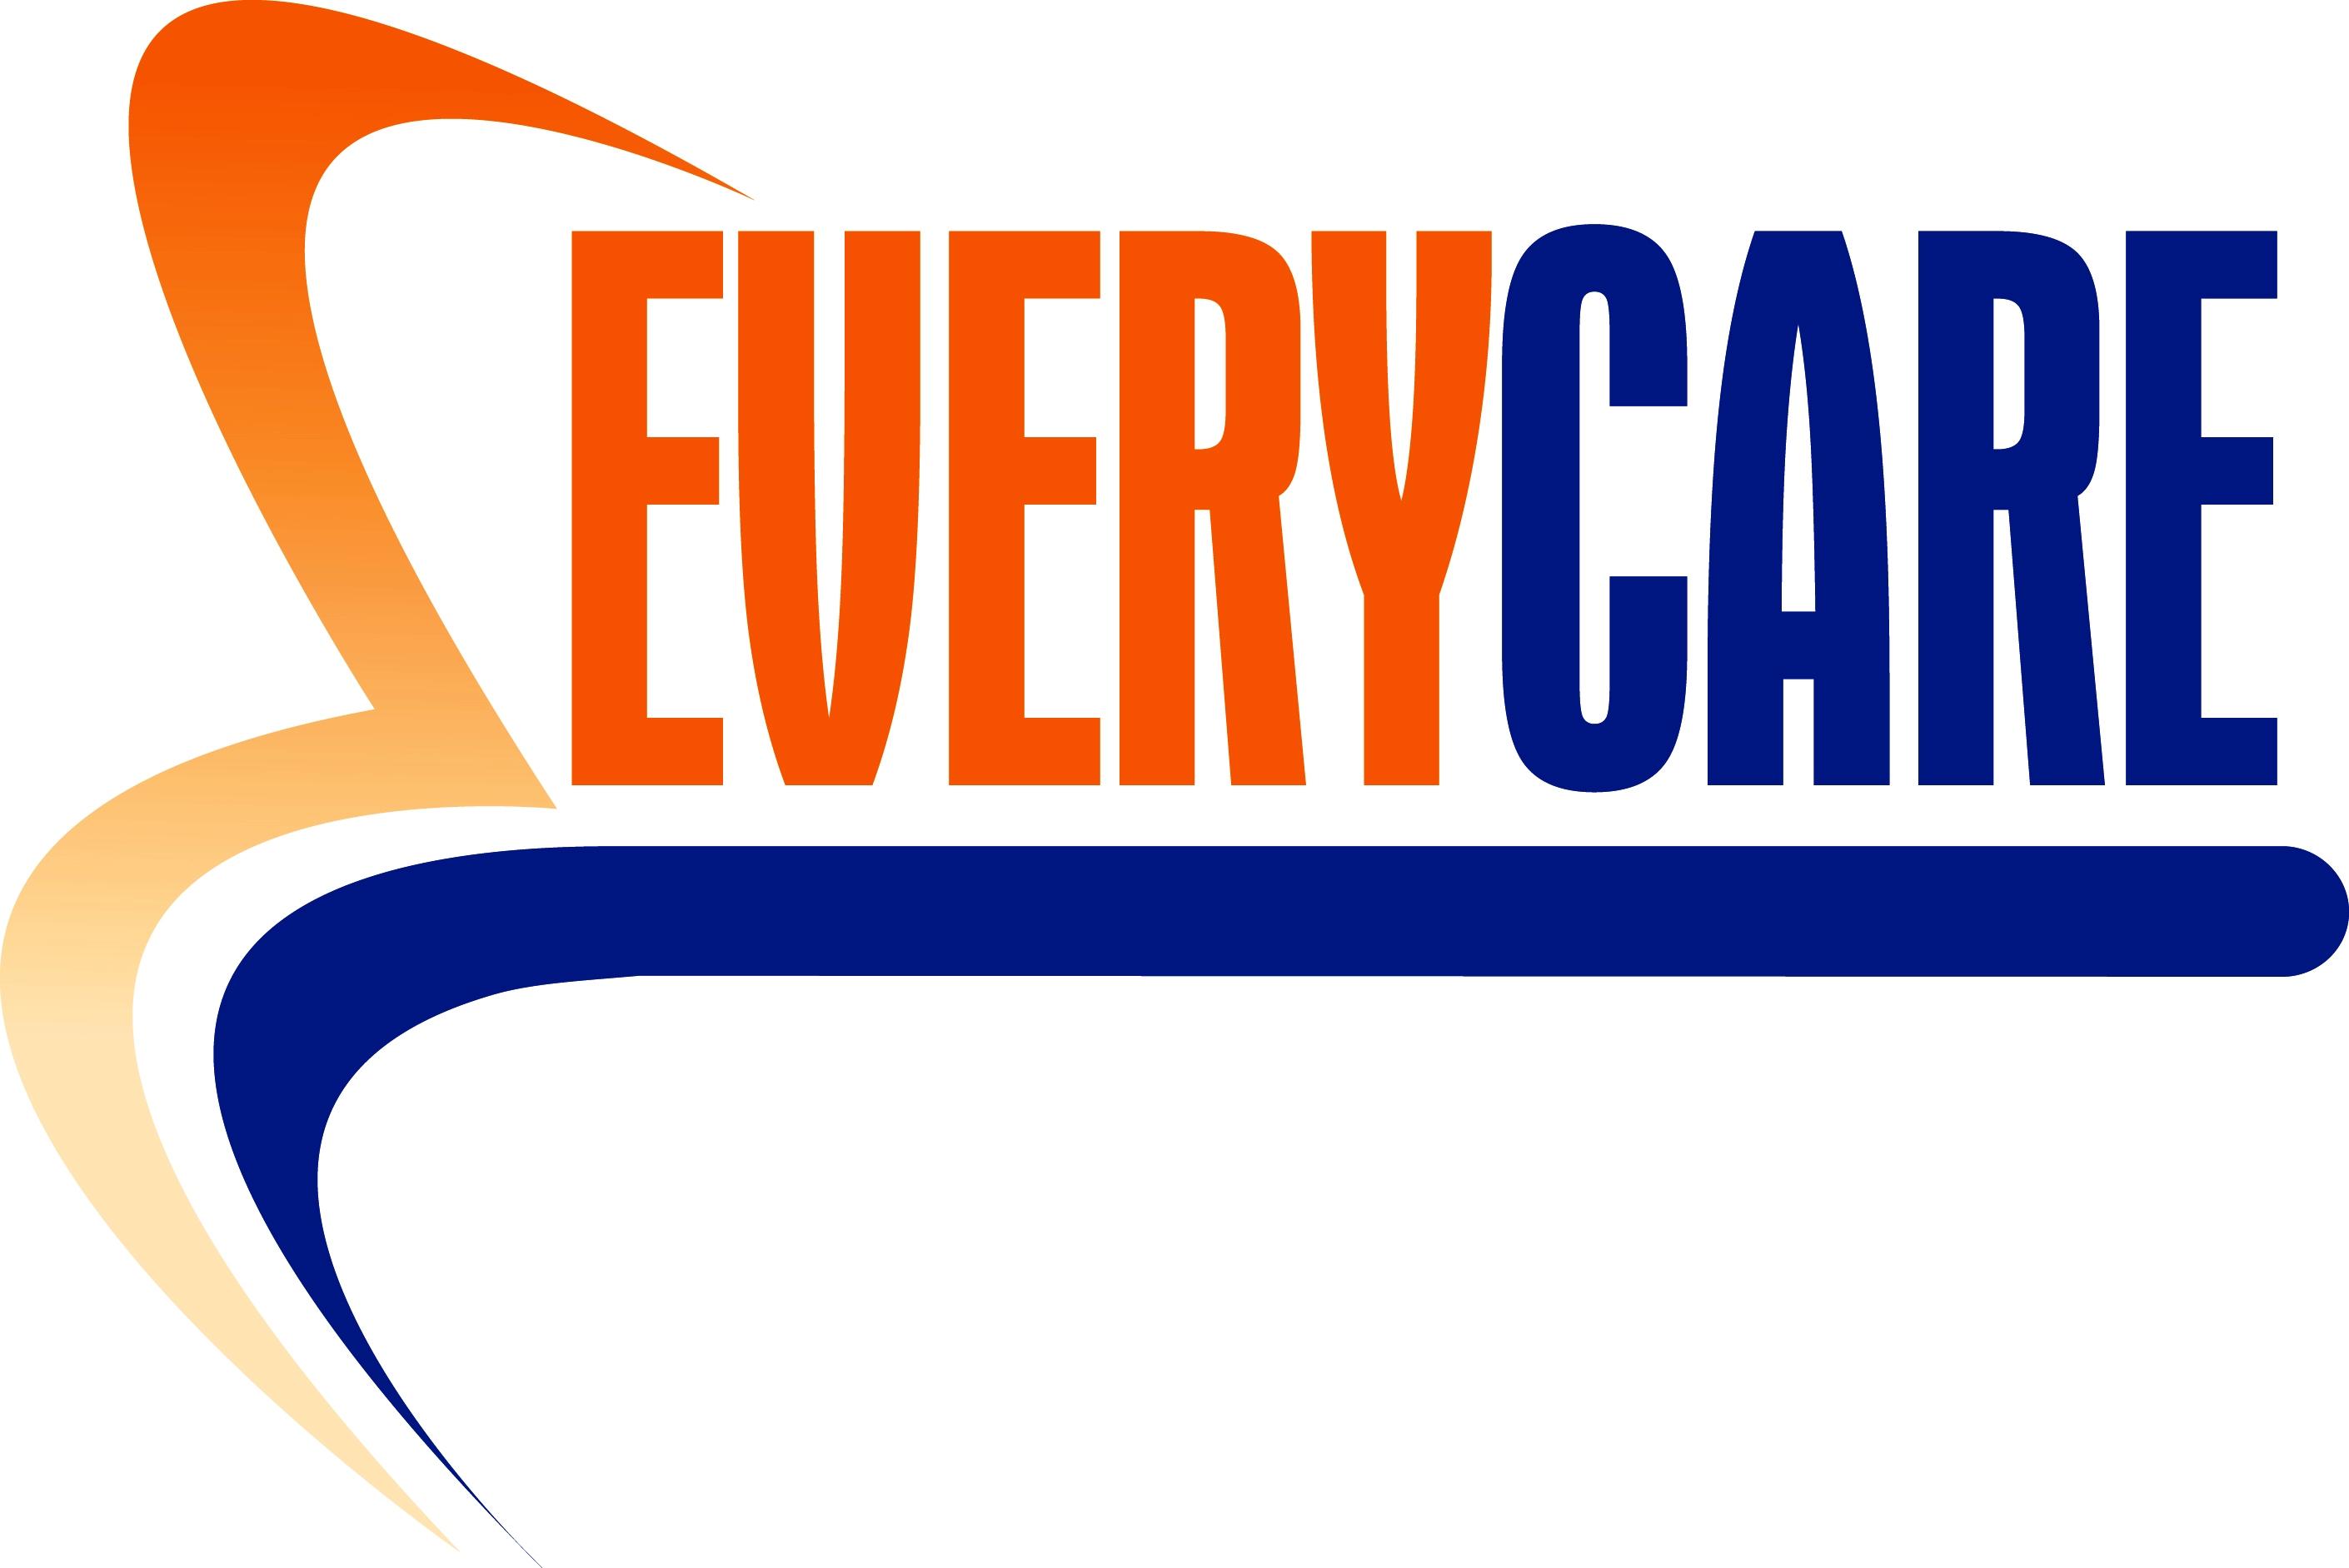 Everycare Central Hants Ltd